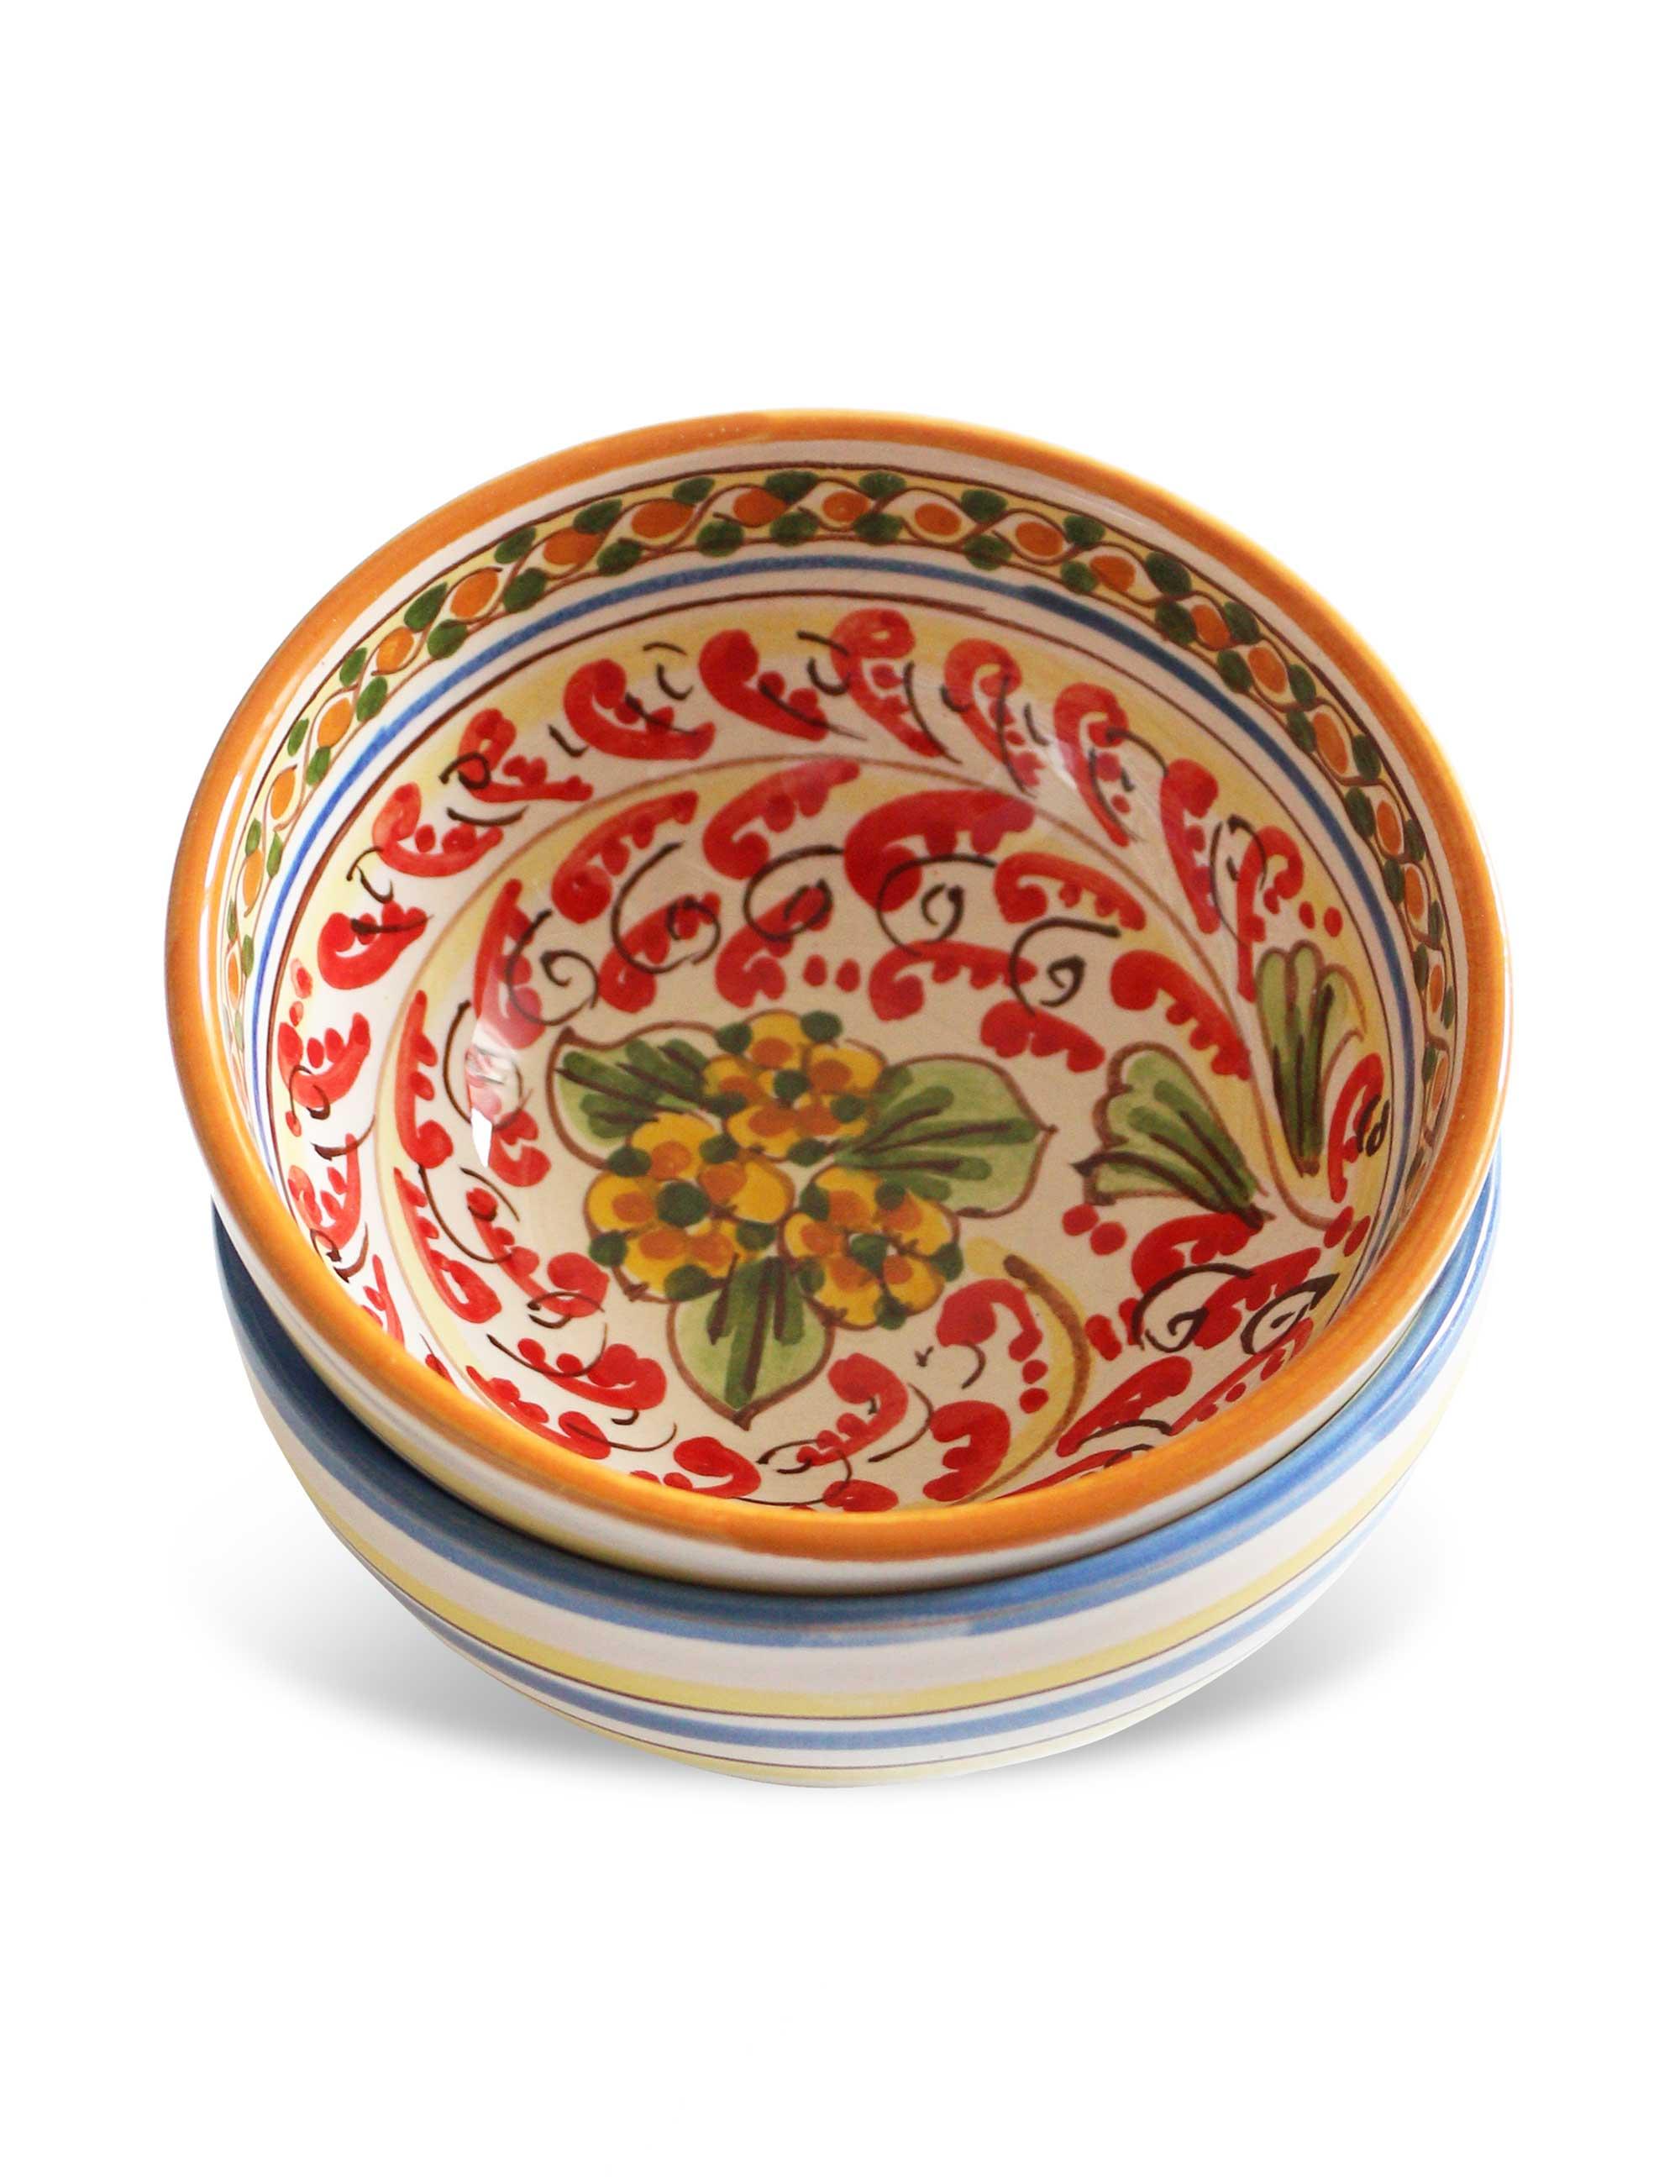 coppa ceramica caltagirone decorata ideale per frutta tapas aperitivi taralli patatine